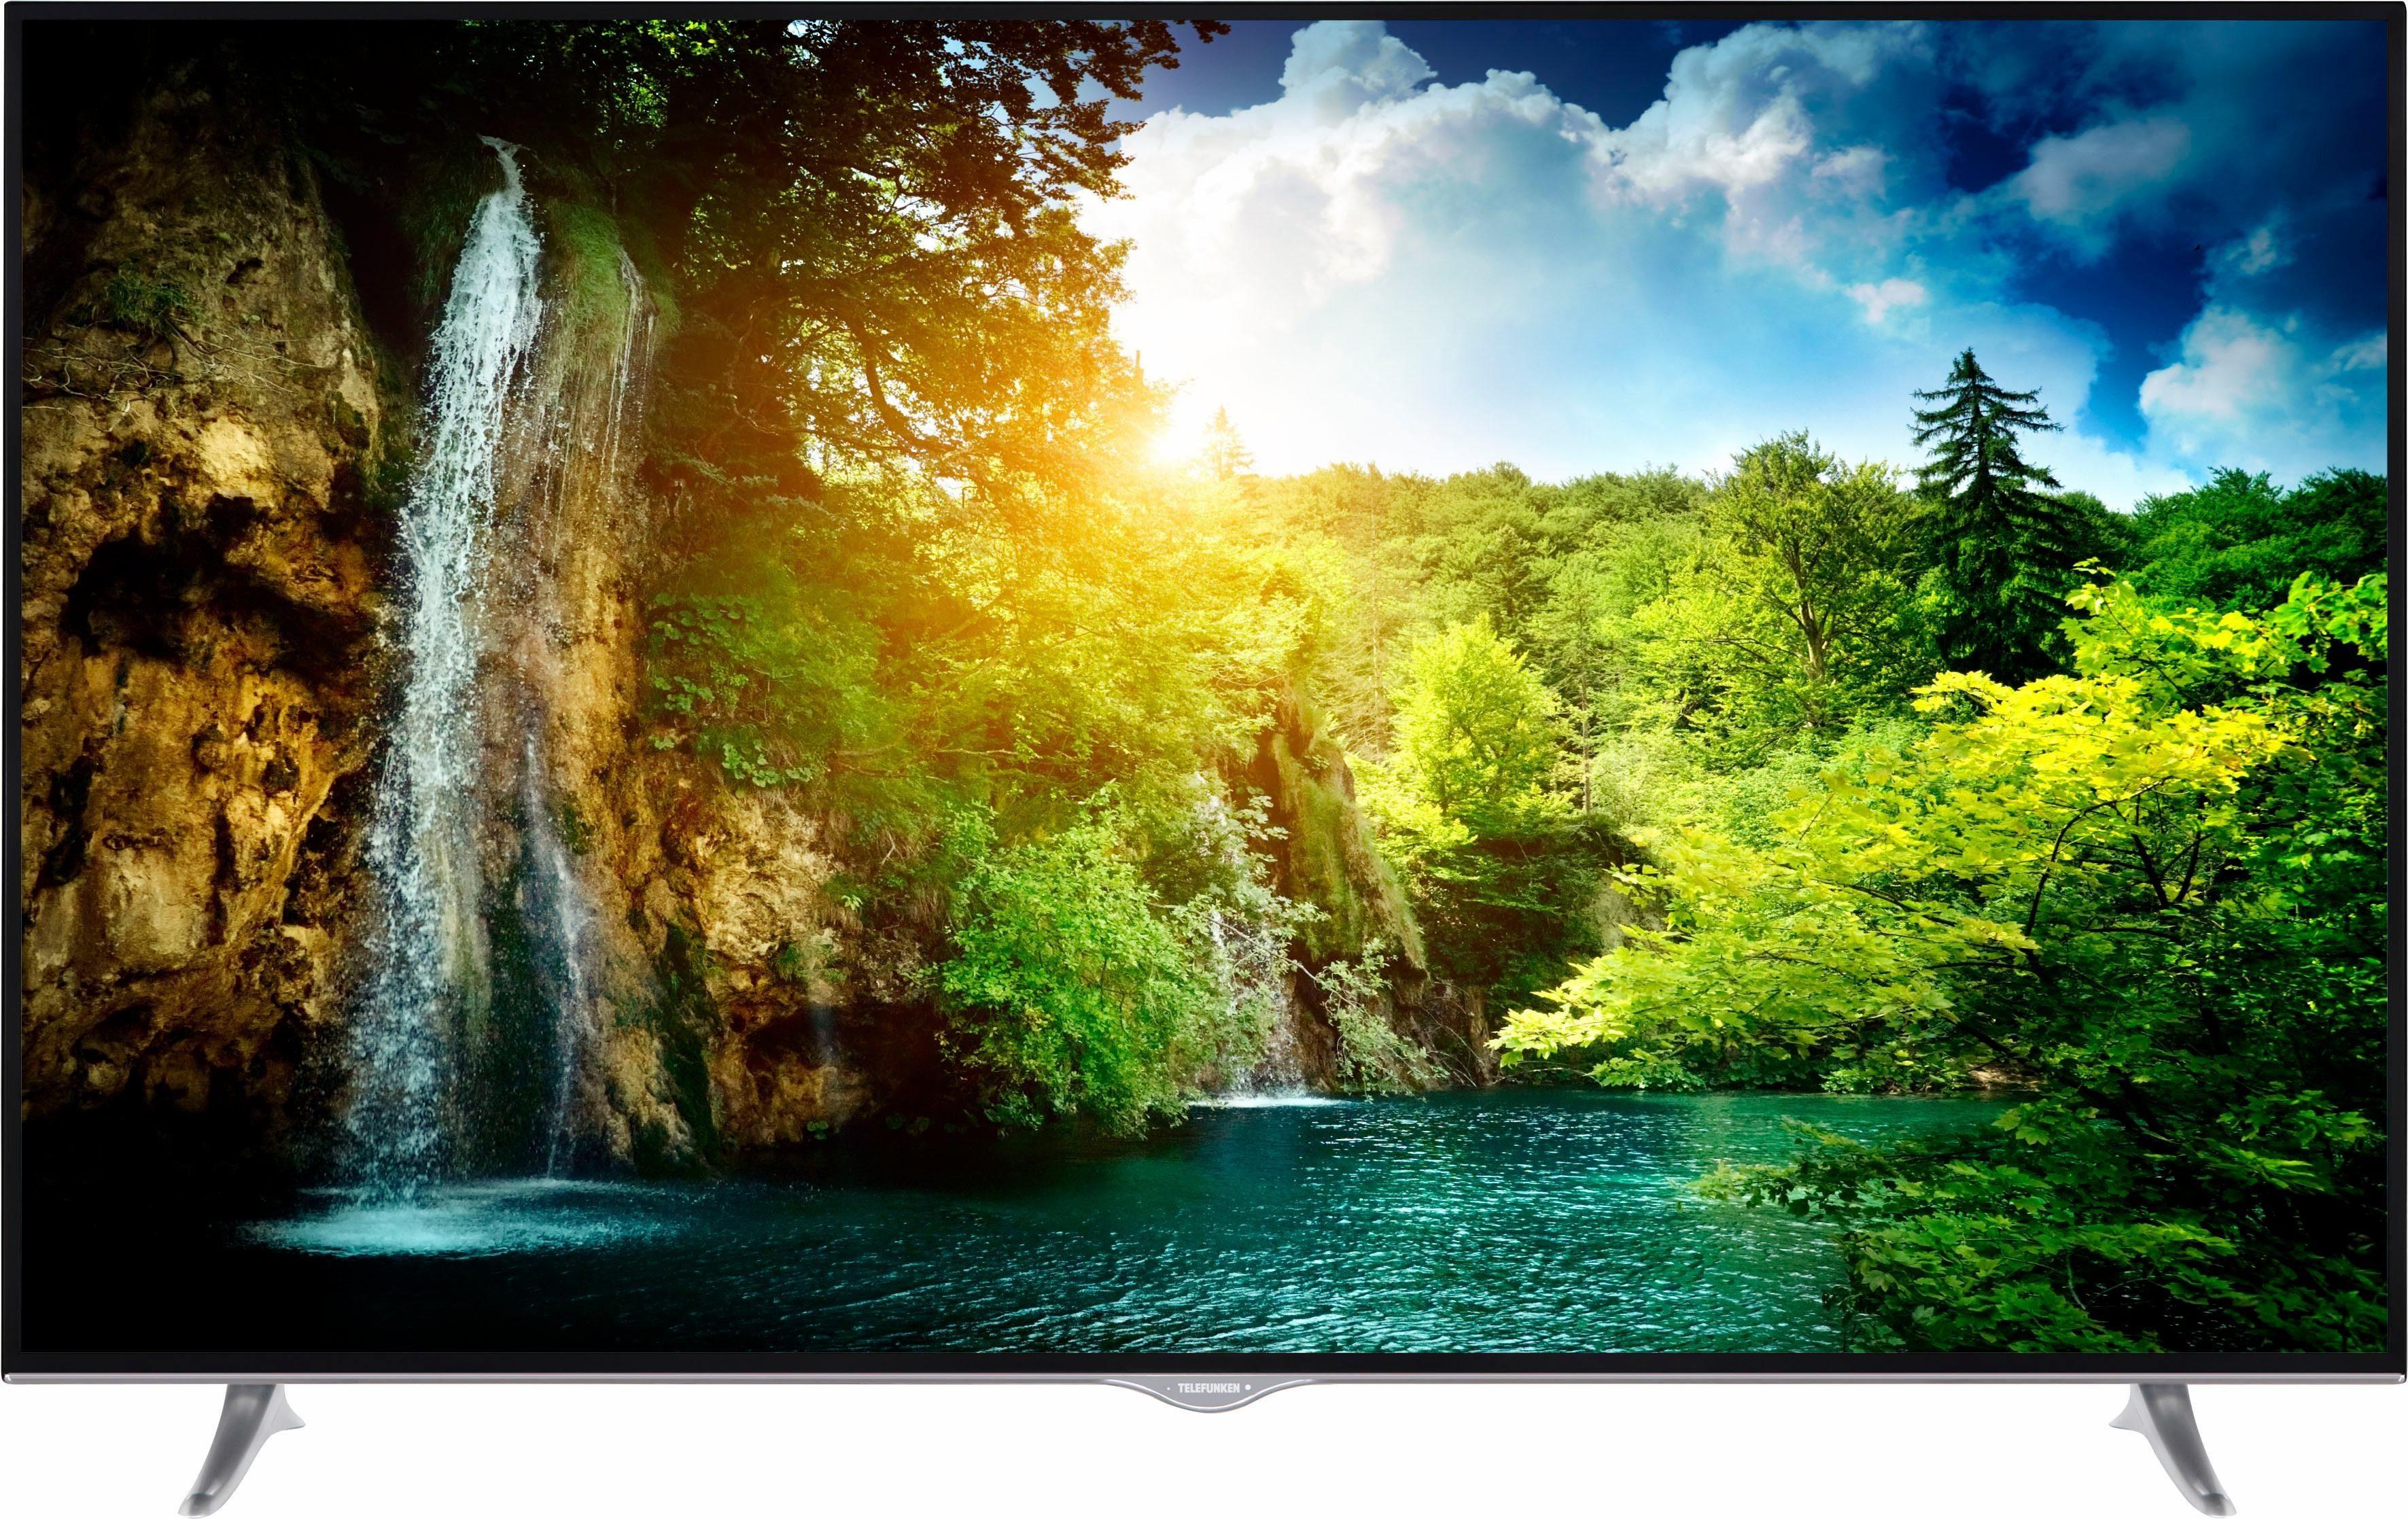 Telefunken D65U600M4CW LED-Fernseher (164 cm/65 Zoll, 4K Ultra HD, Smart-TV, 36 Monate Garantie)